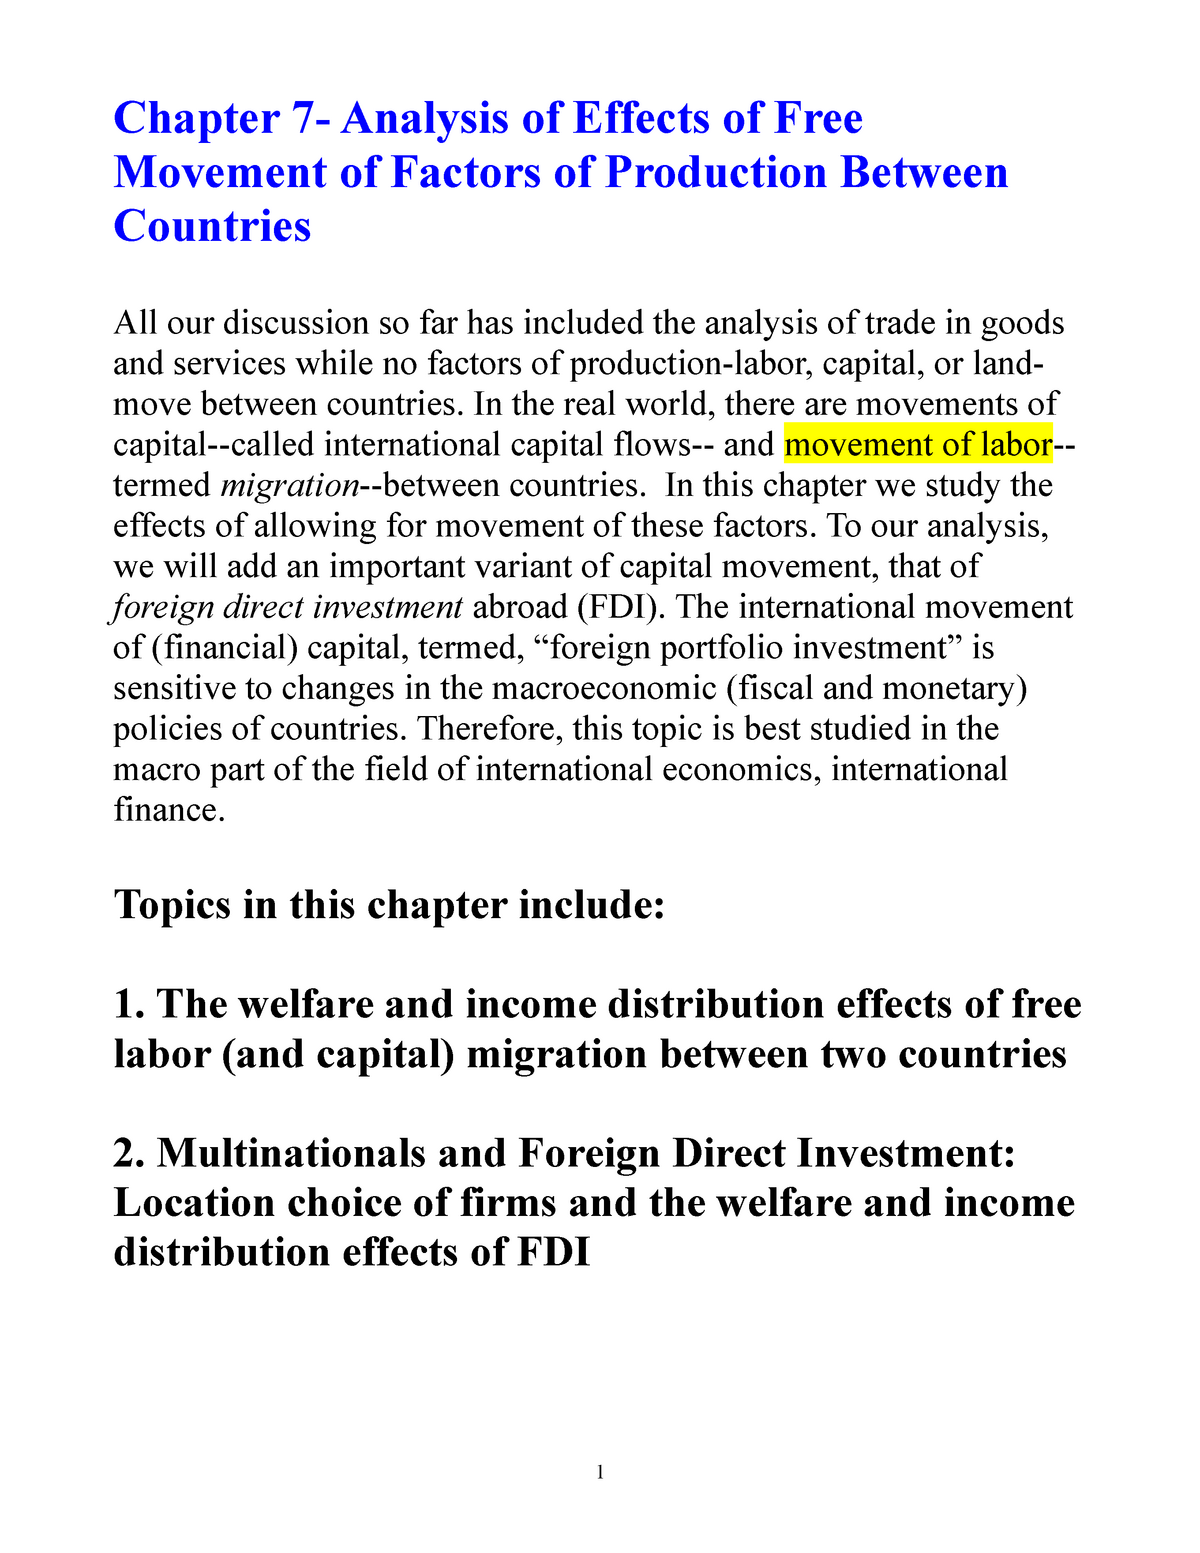 Impact of international taxation on FDI location choice